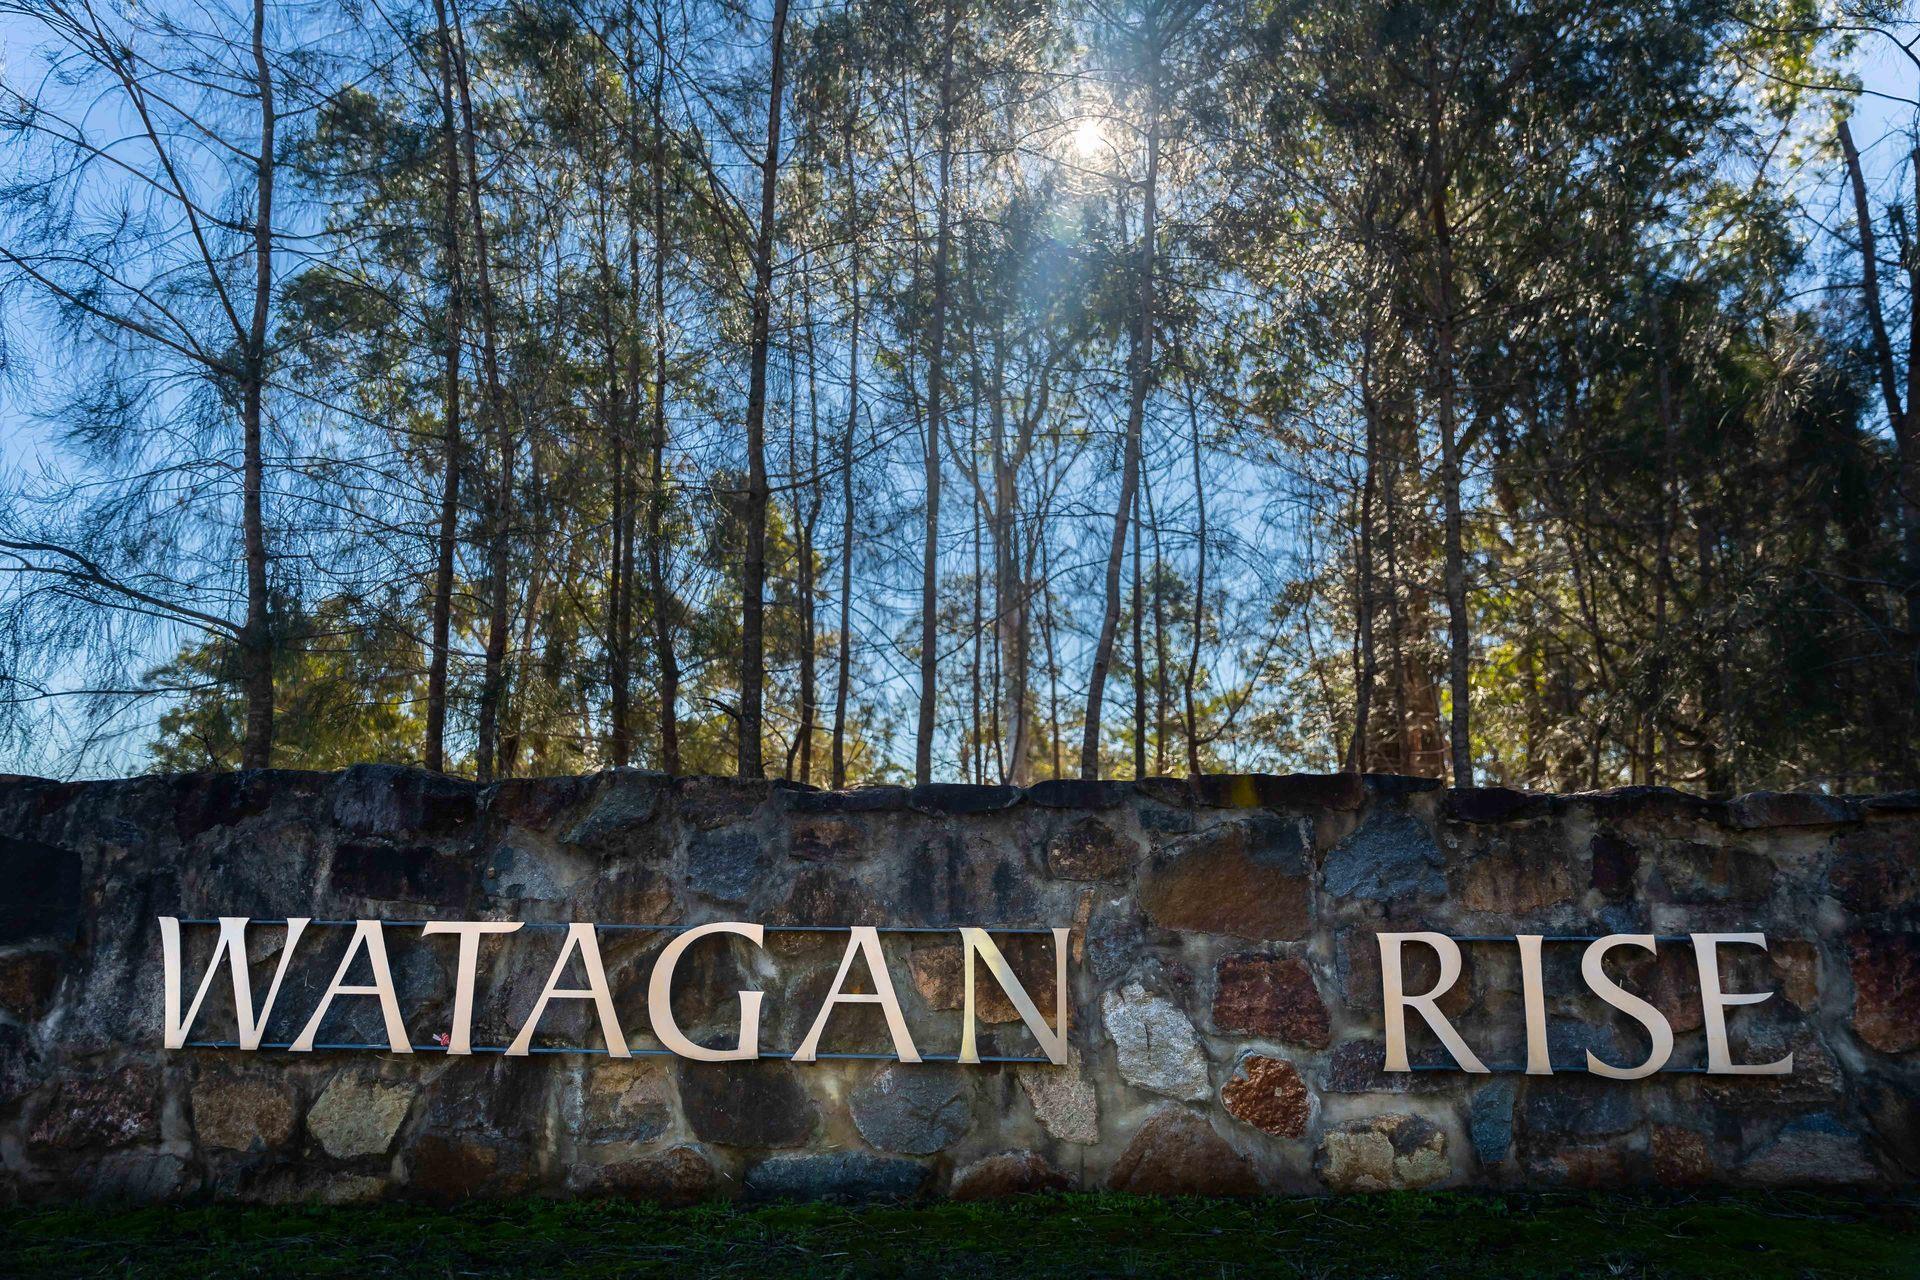 Paxton LOT 614 Dianella Cres   Watagan Rise